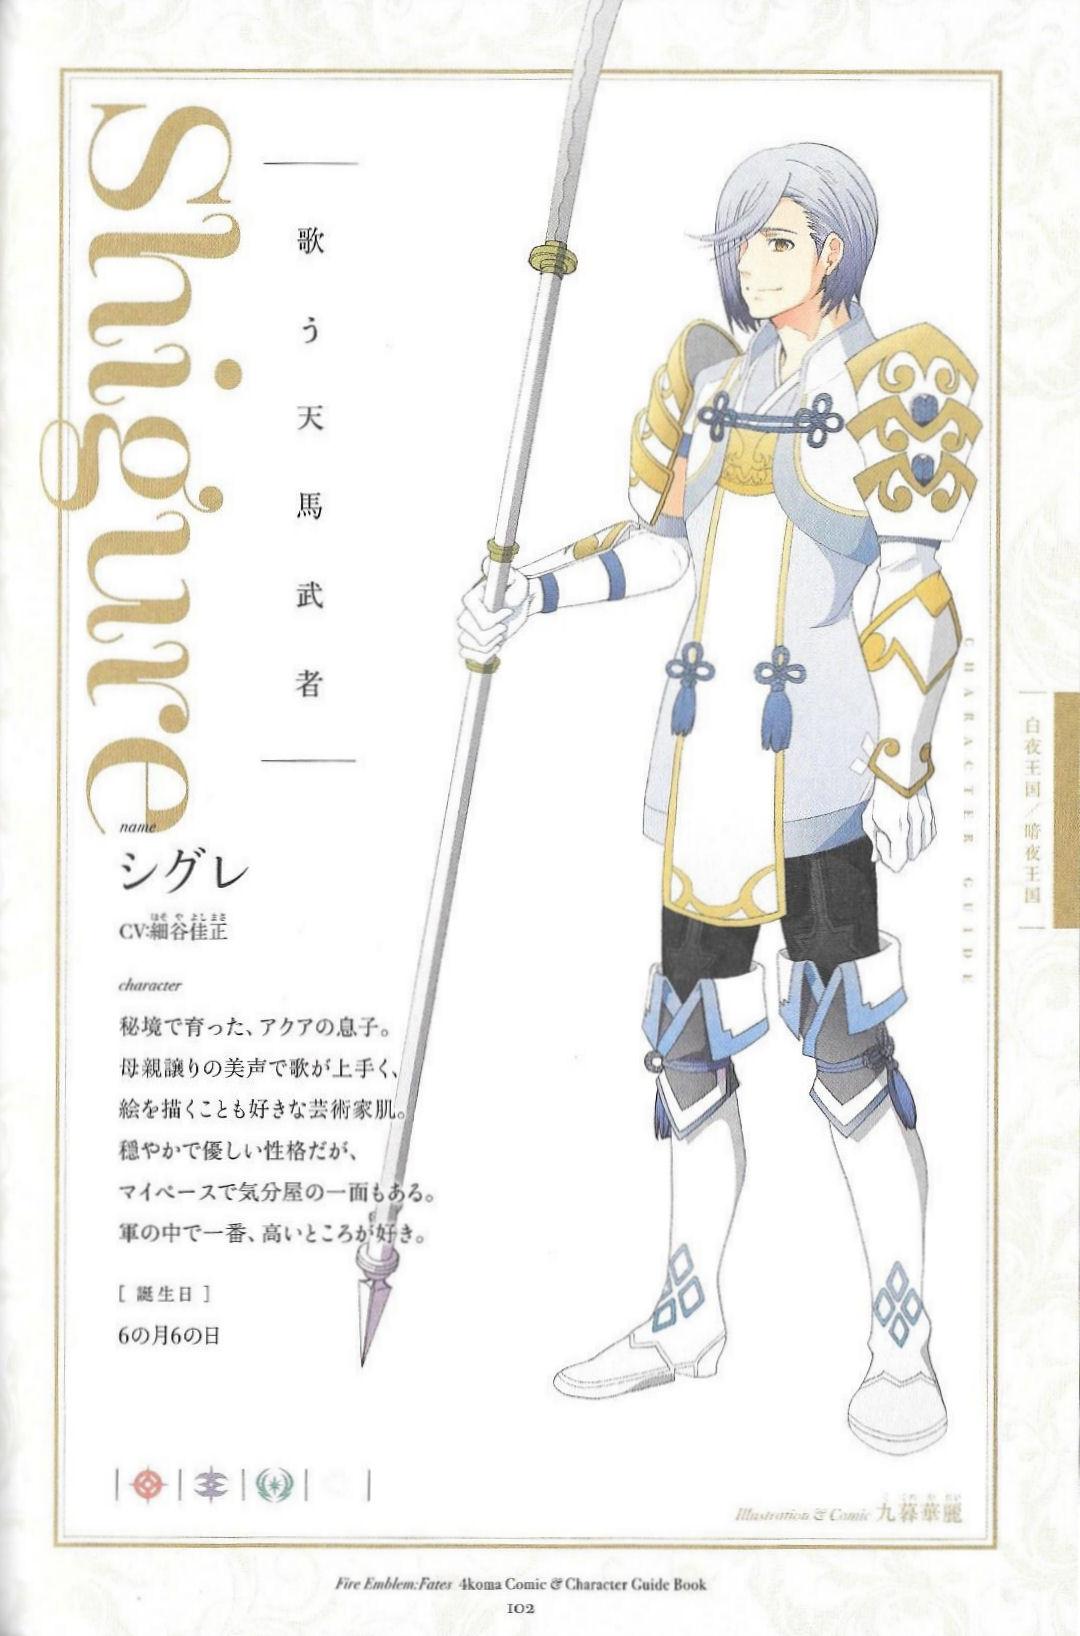 Fire Emblem if 4 koma Character Guide Book Anthology Comic